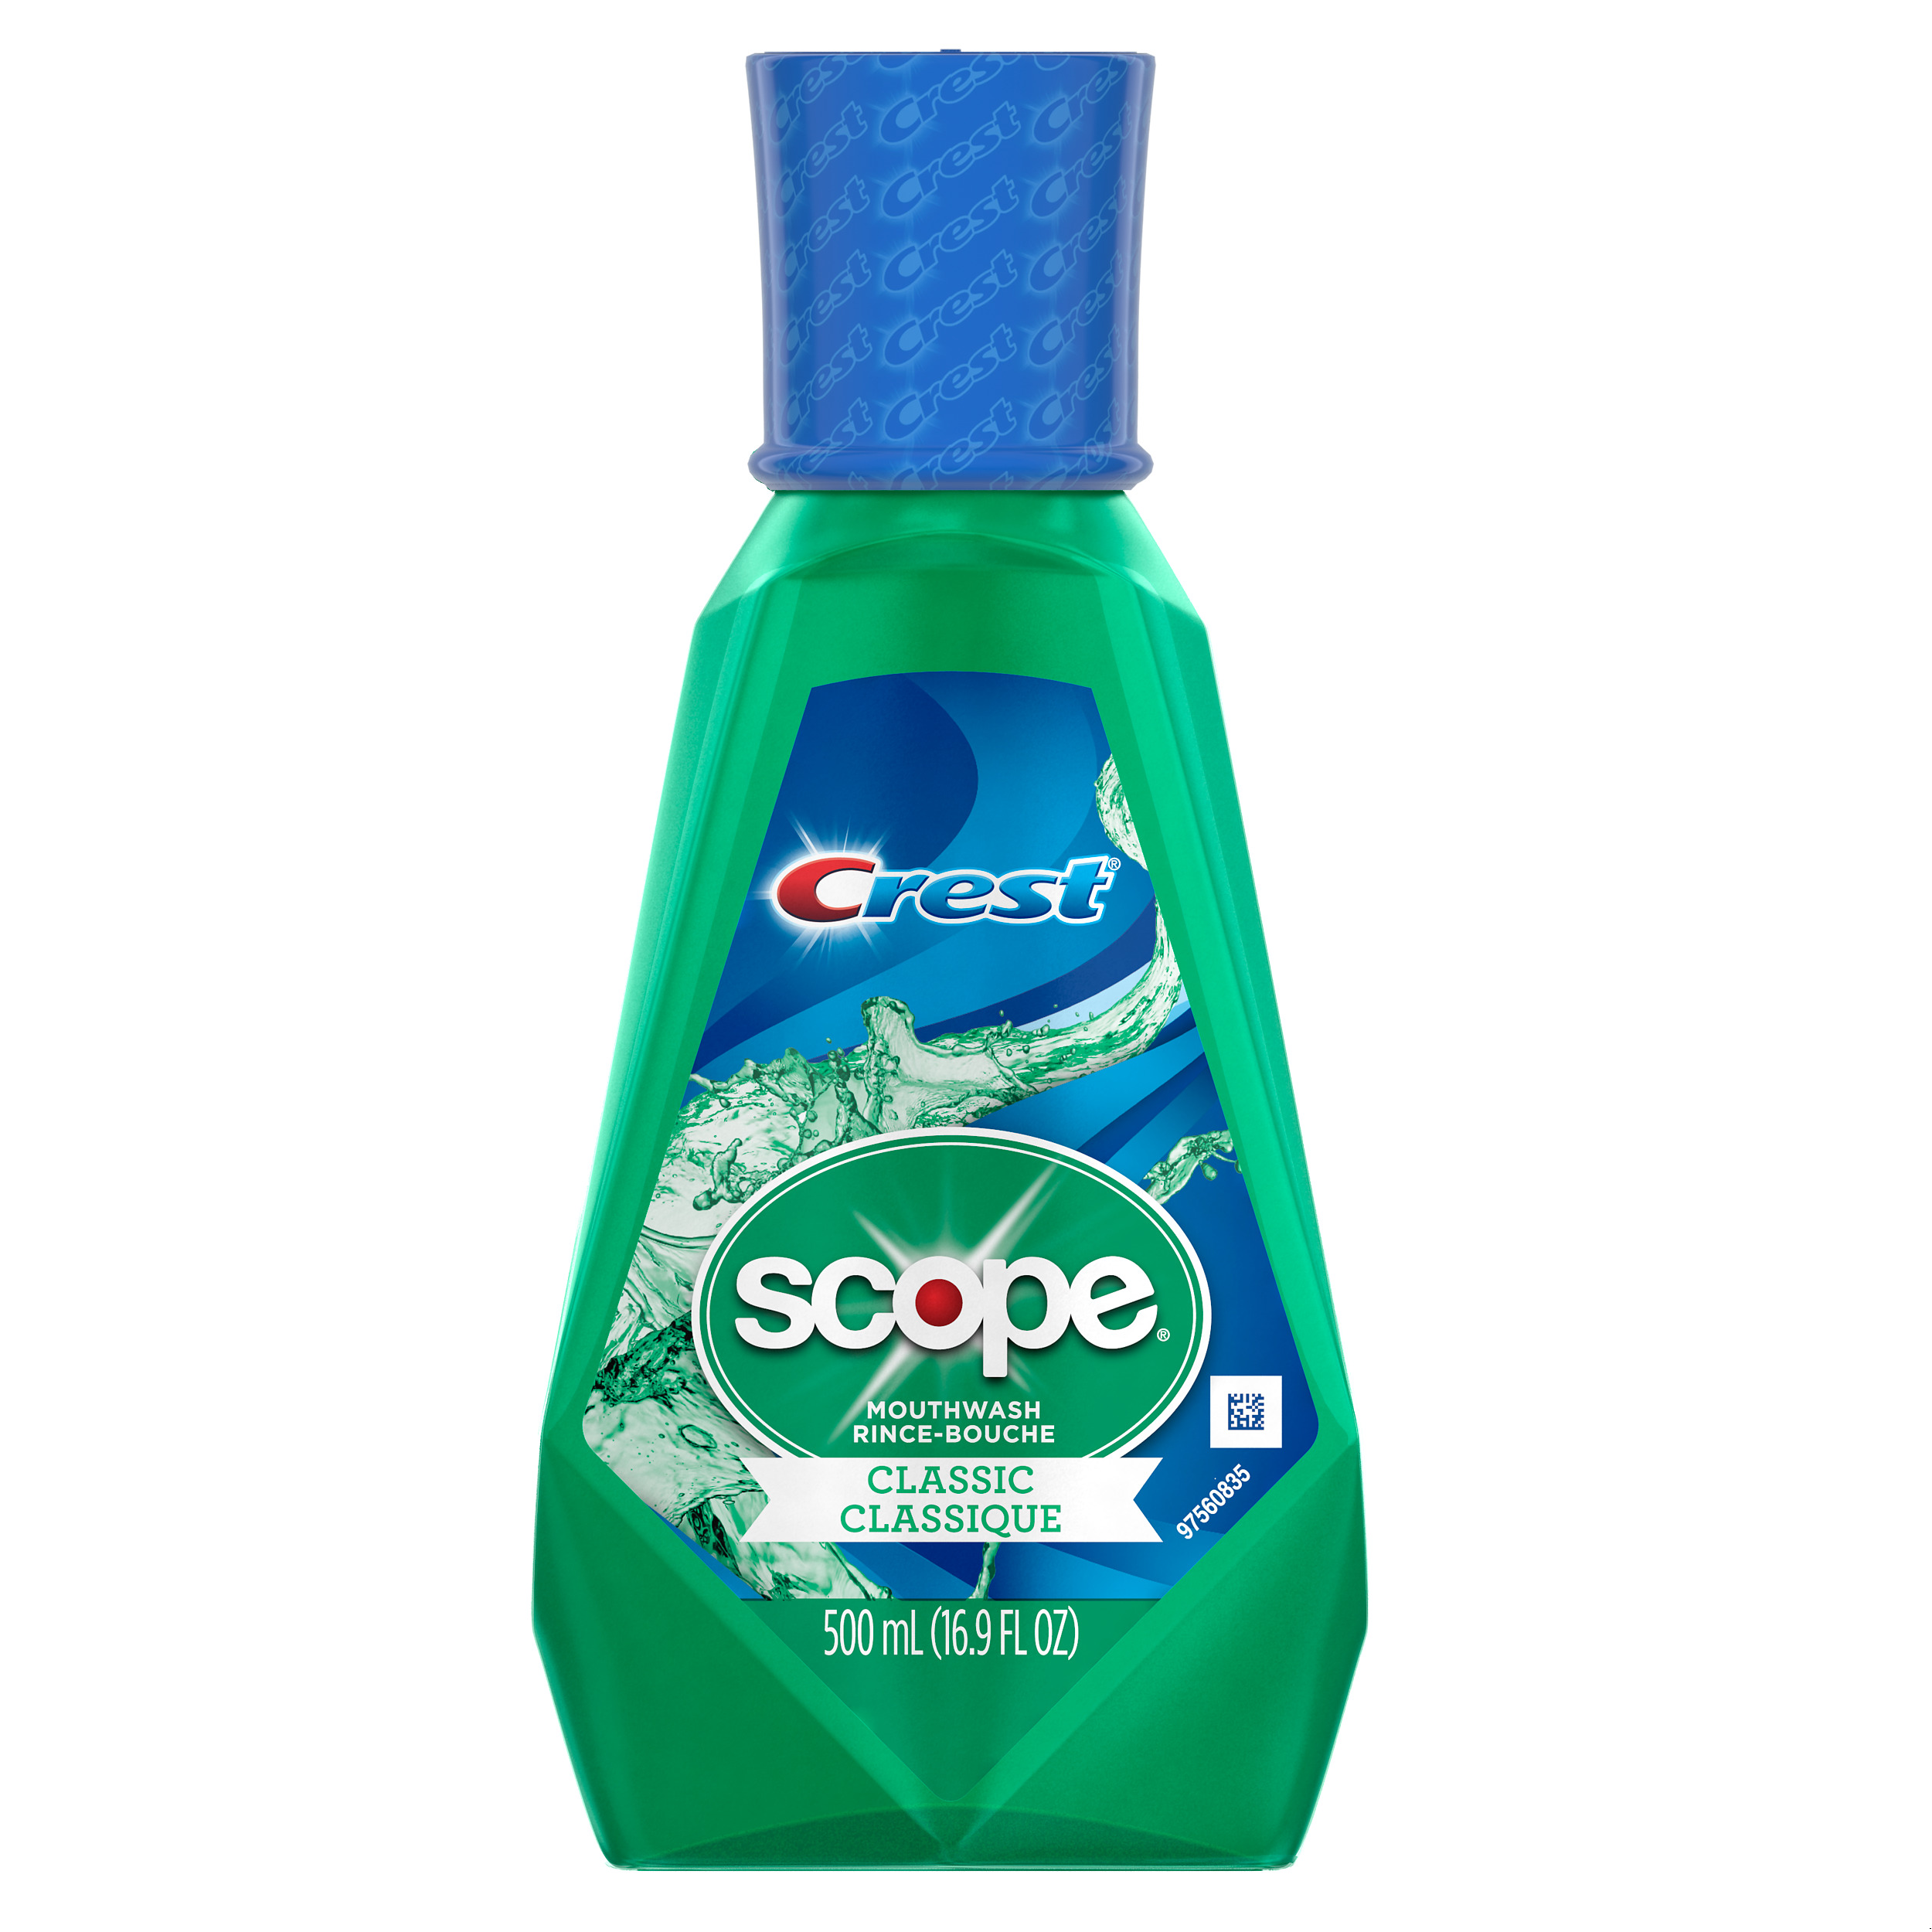 Crest Scope Classic Mouthwash, Original Formula, 500 mL